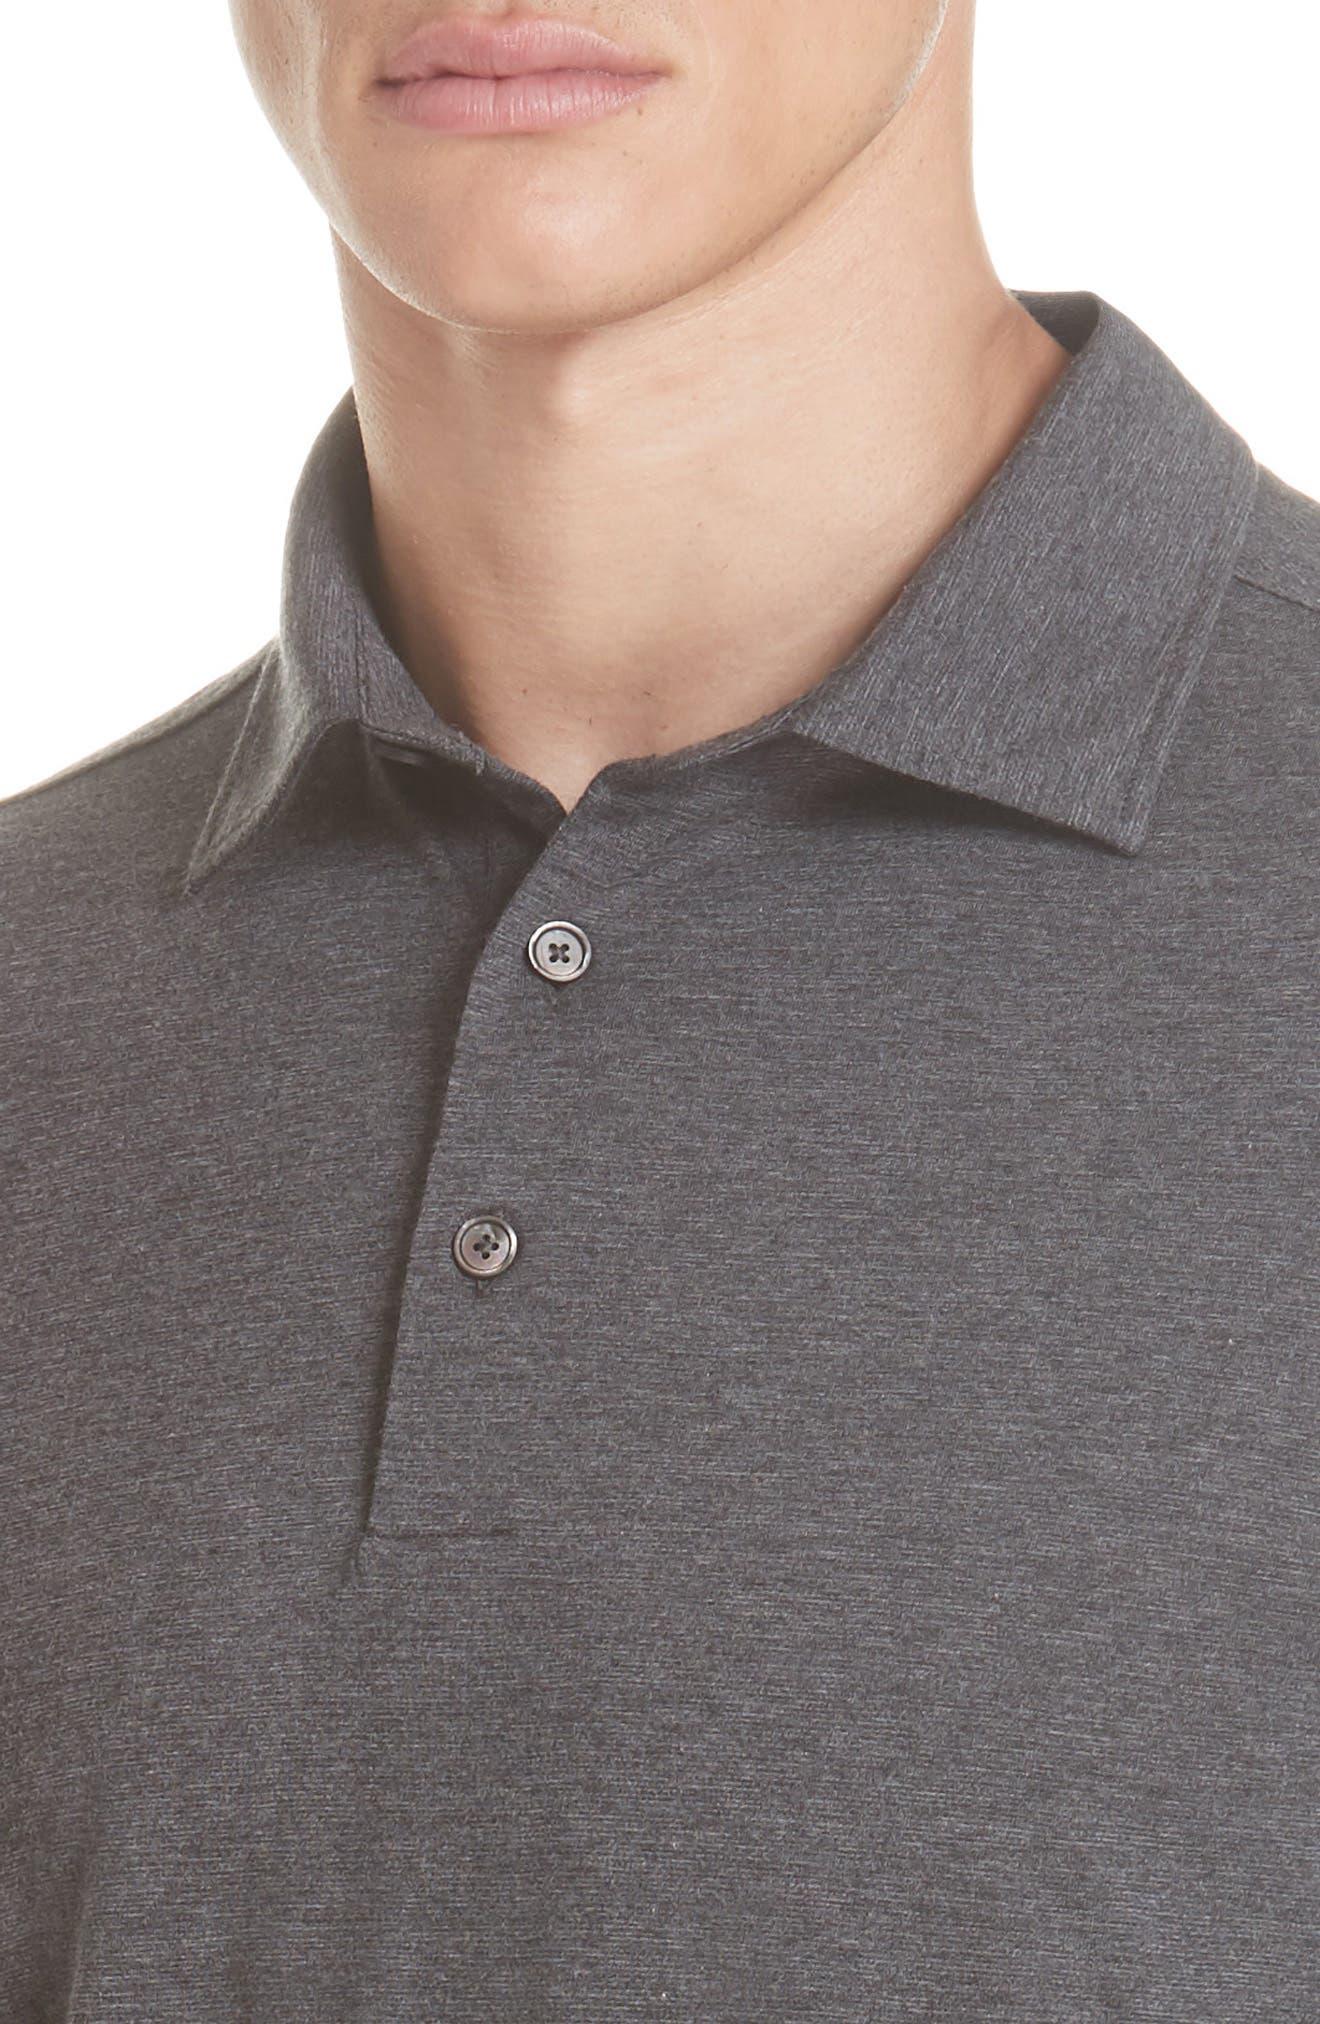 Wool & Cotton Long Sleeve Polo Shirt,                             Alternate thumbnail 4, color,                             CHARCOAL